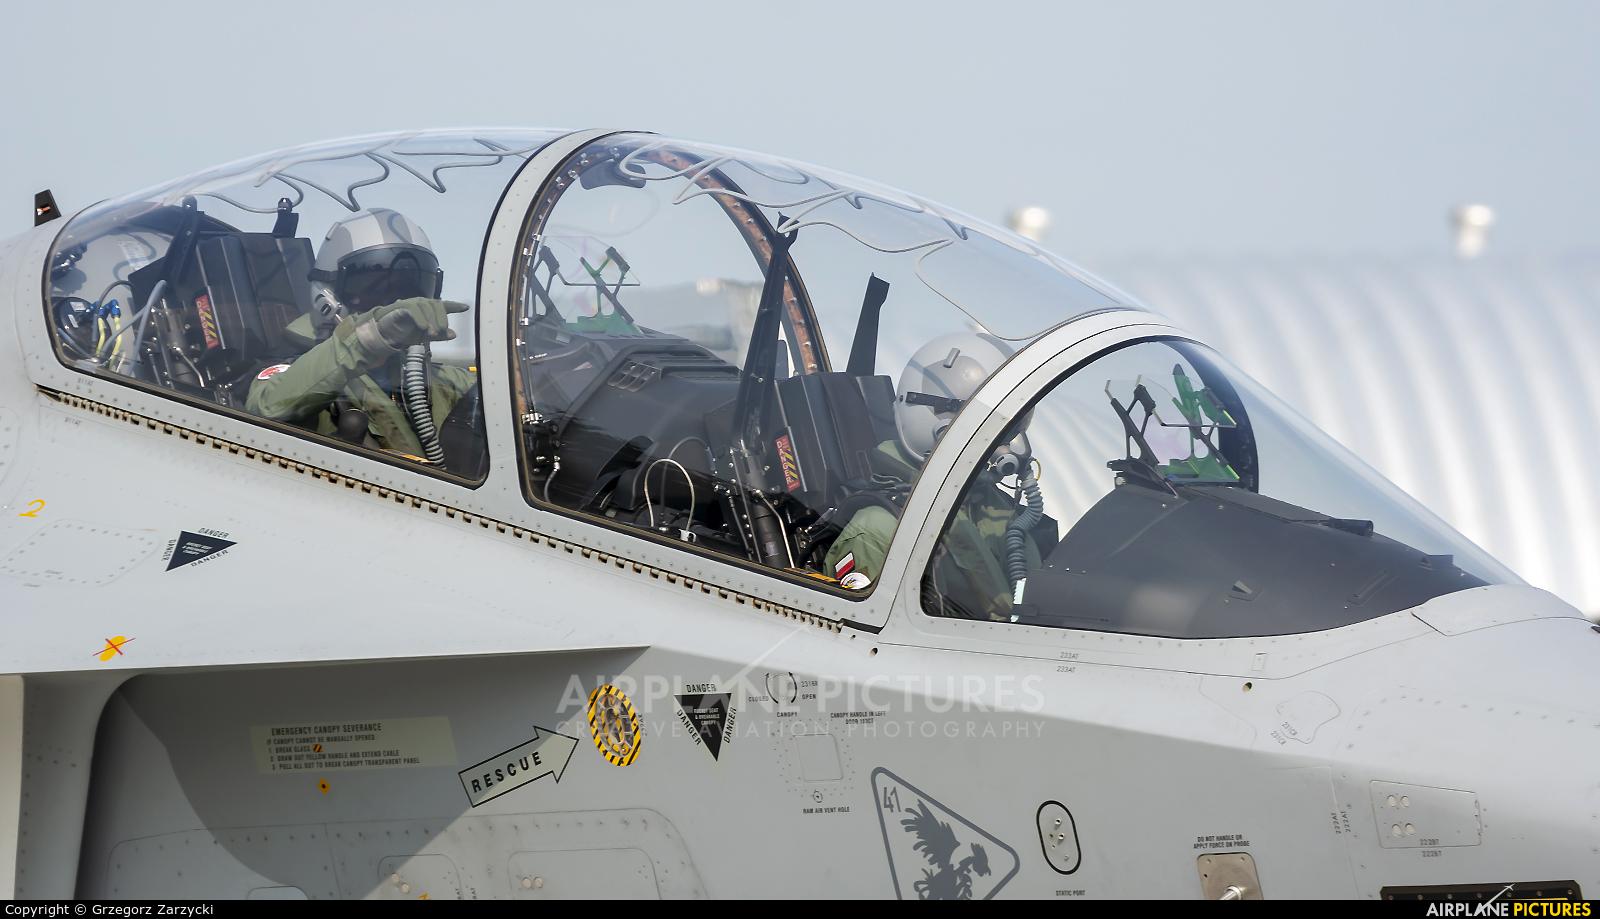 Poland - Air Force 7706 aircraft at Dęblin